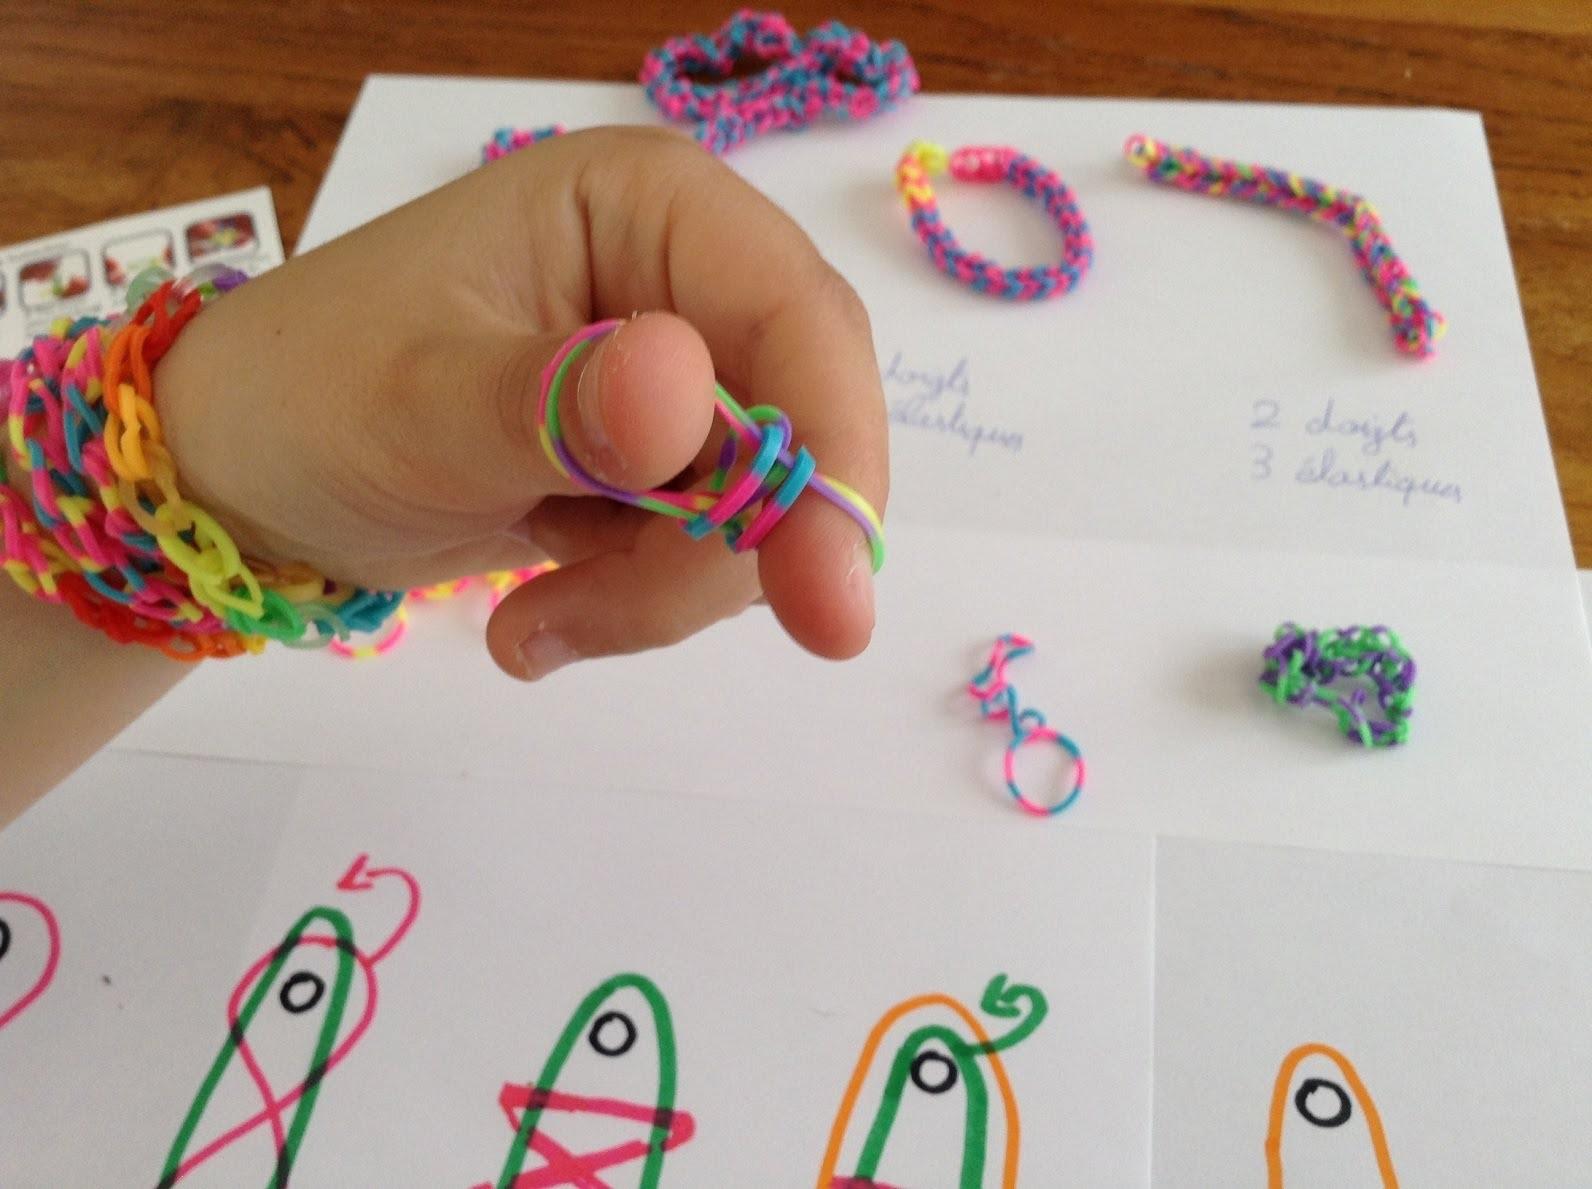 Bracelet Rainbow Loom elastiques Cra-Z-loom